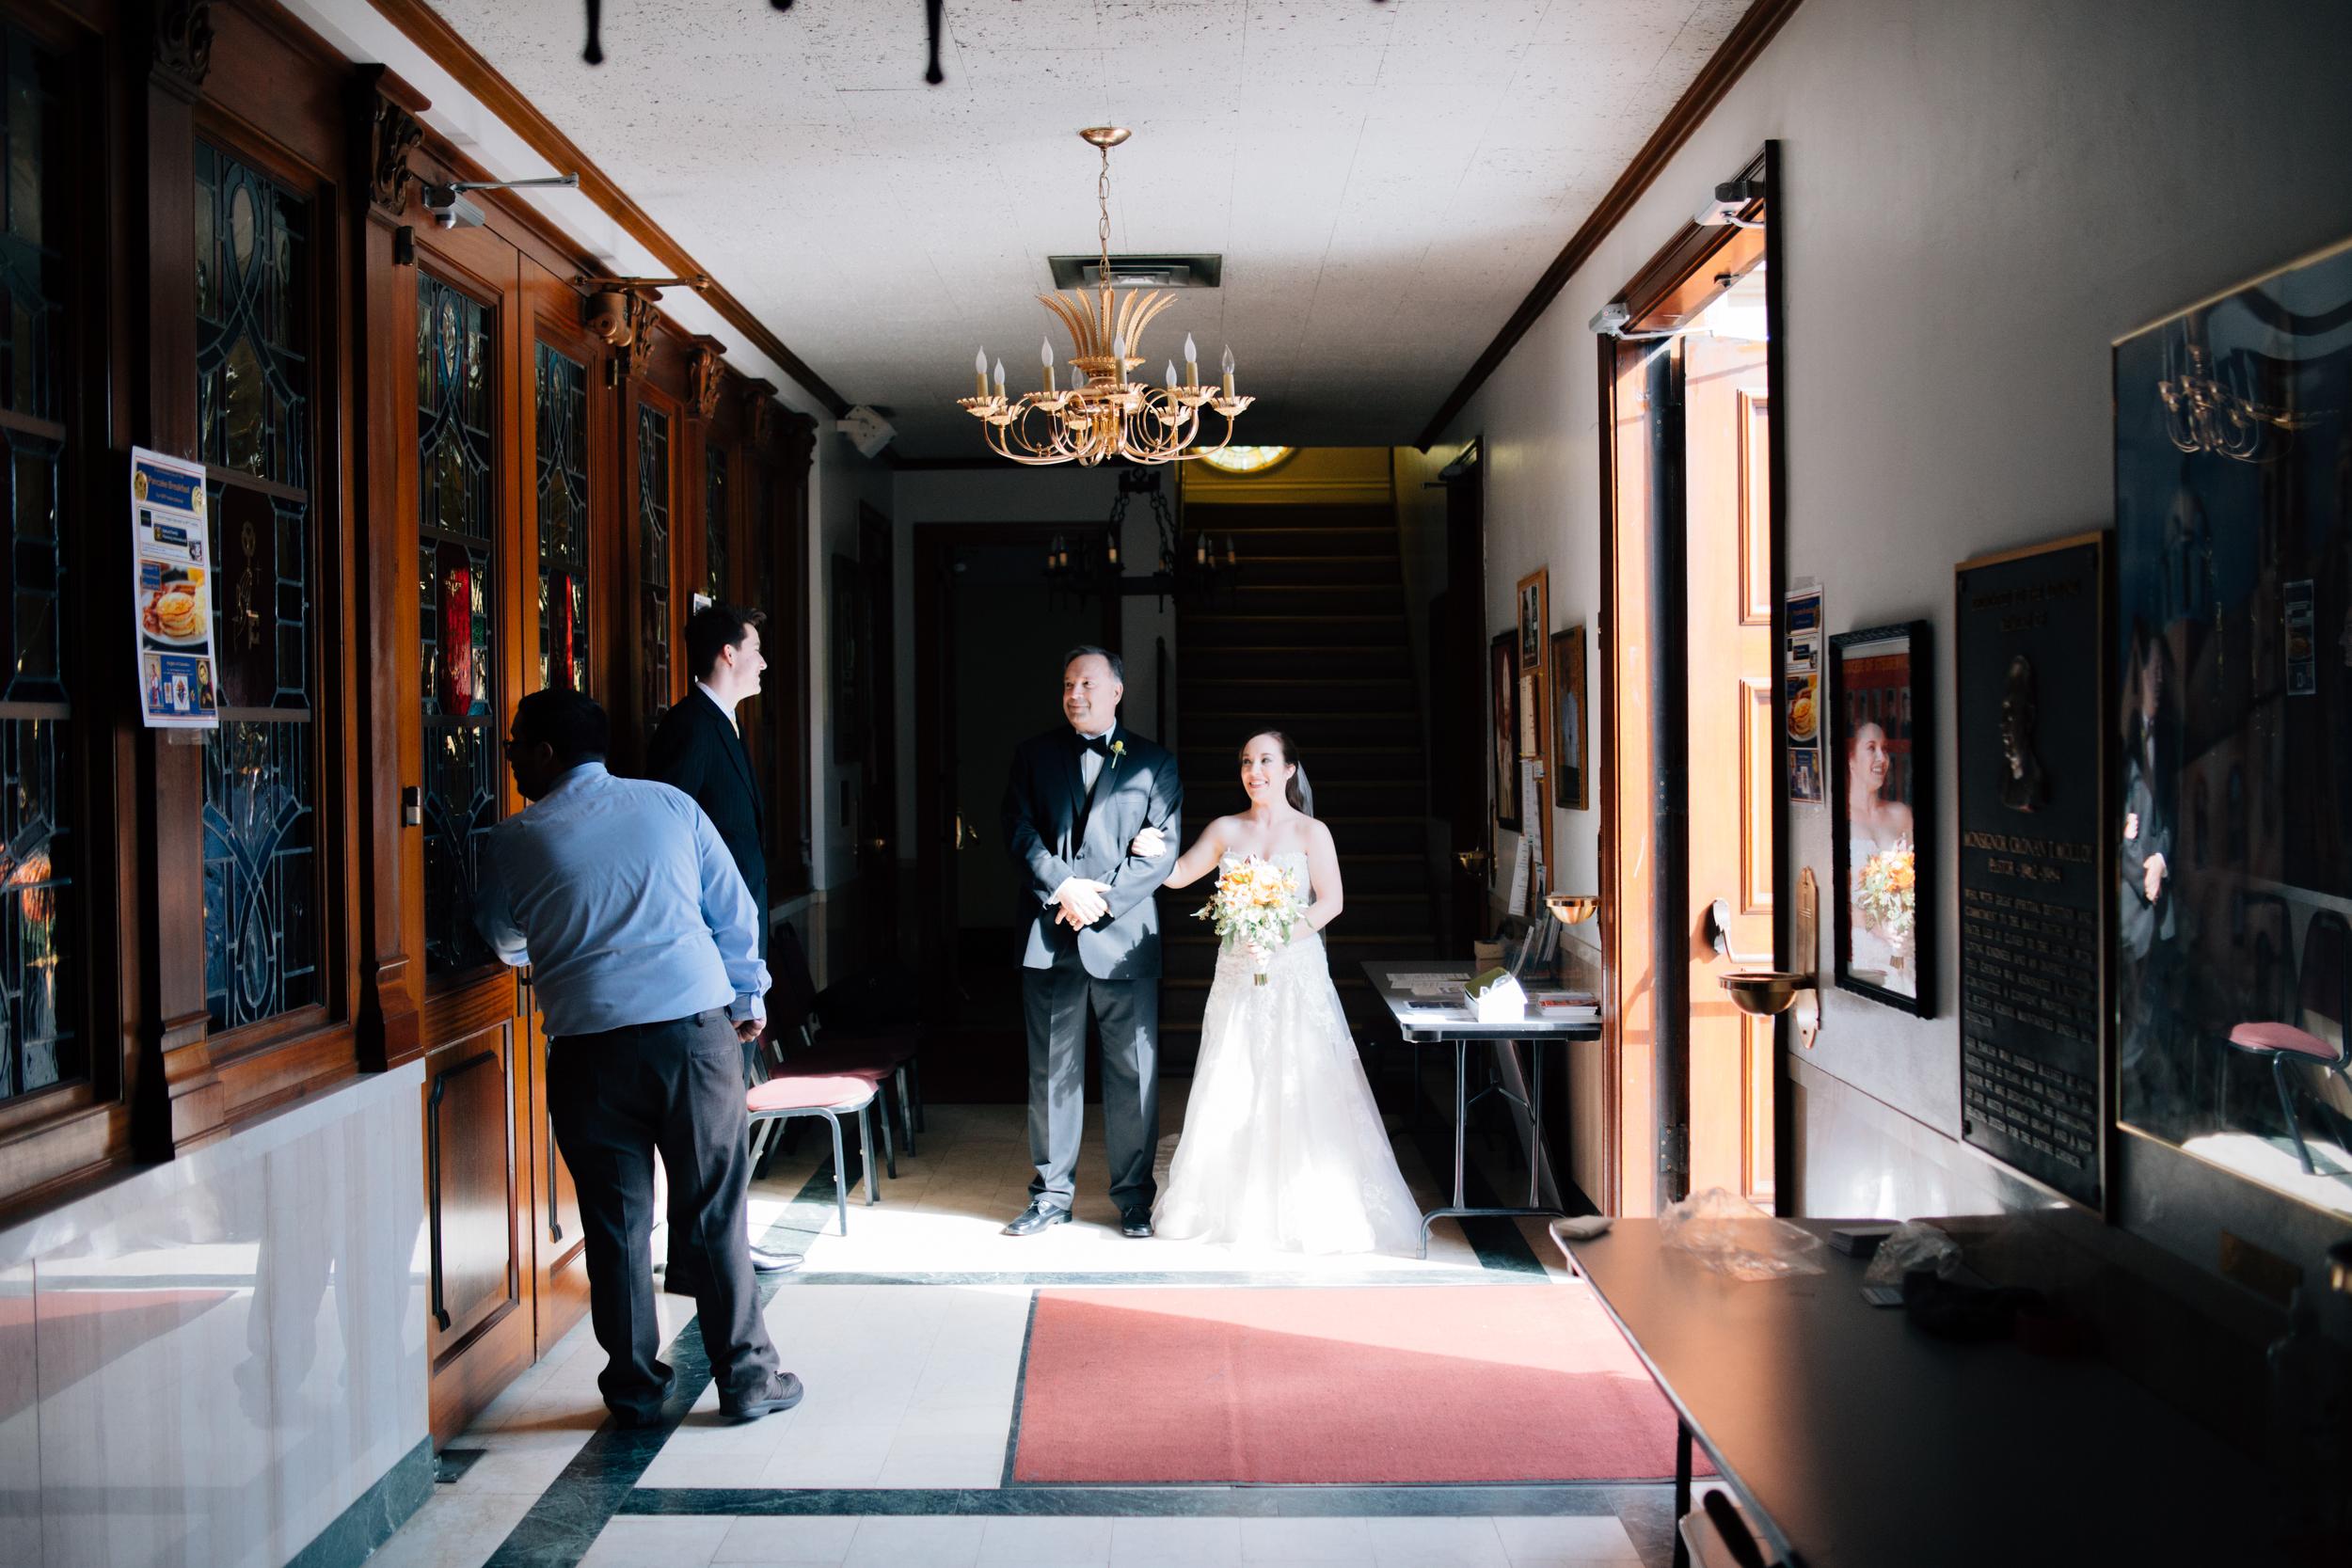 008-cam2-ceremony.jpg